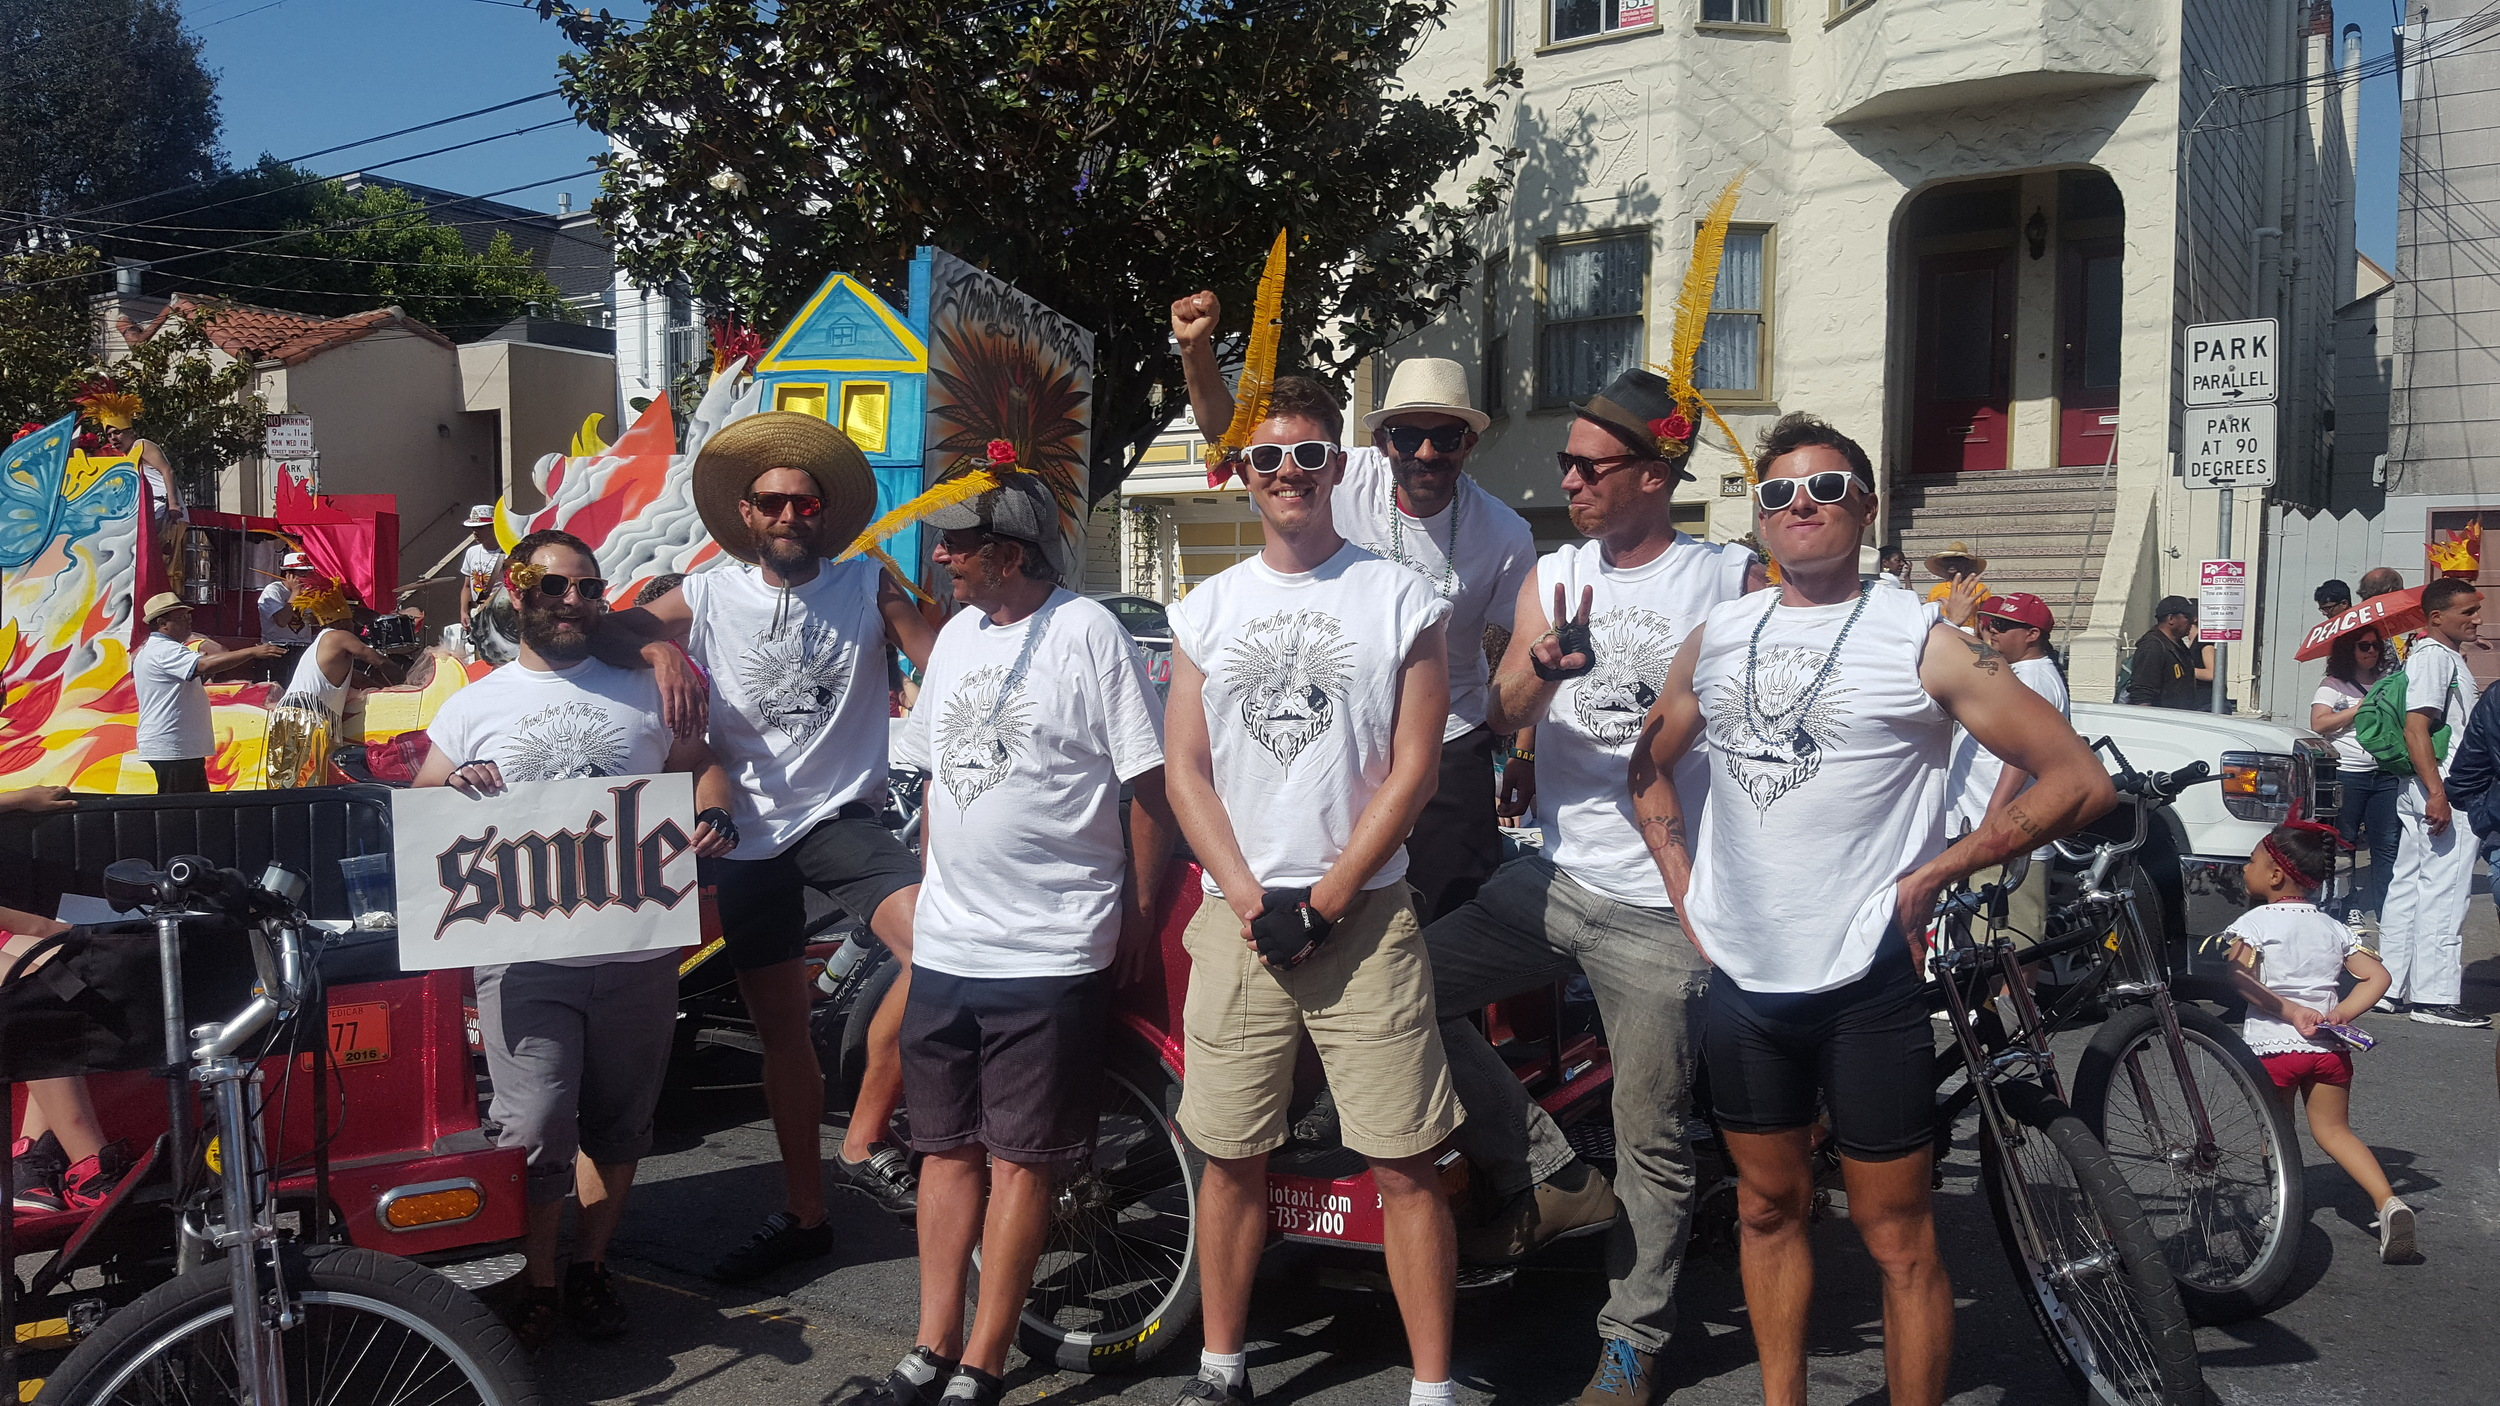 Cabrio's Proud Crew:Keith Sherman, Will LaBarge, Kevin Manning, Brady Bakay, Giovanny Roa, Bryan Maddan, Carl Patrick